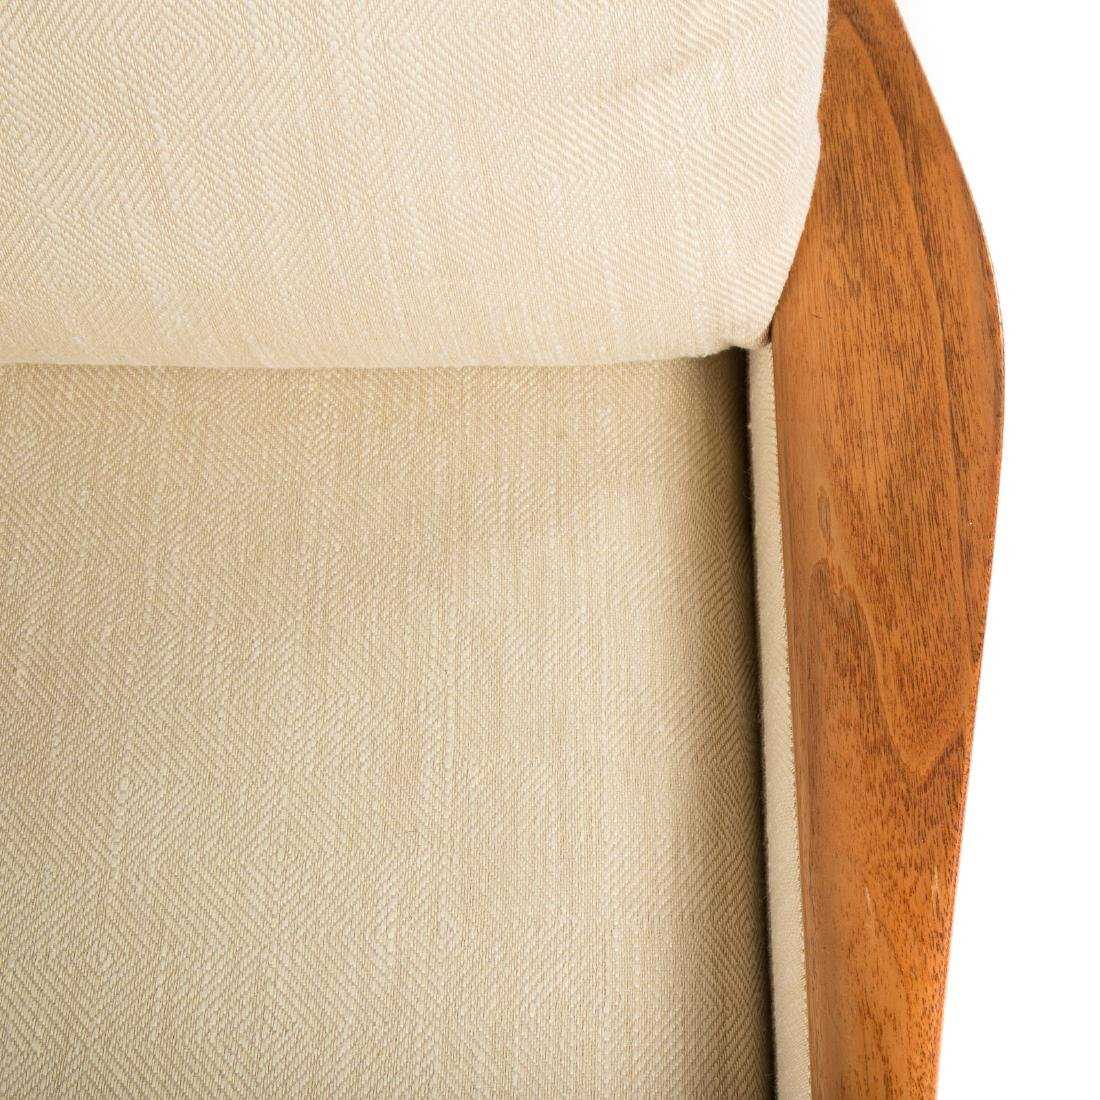 Vladimir Kagan - Dreyfuss walnut upholstered sofa - 5